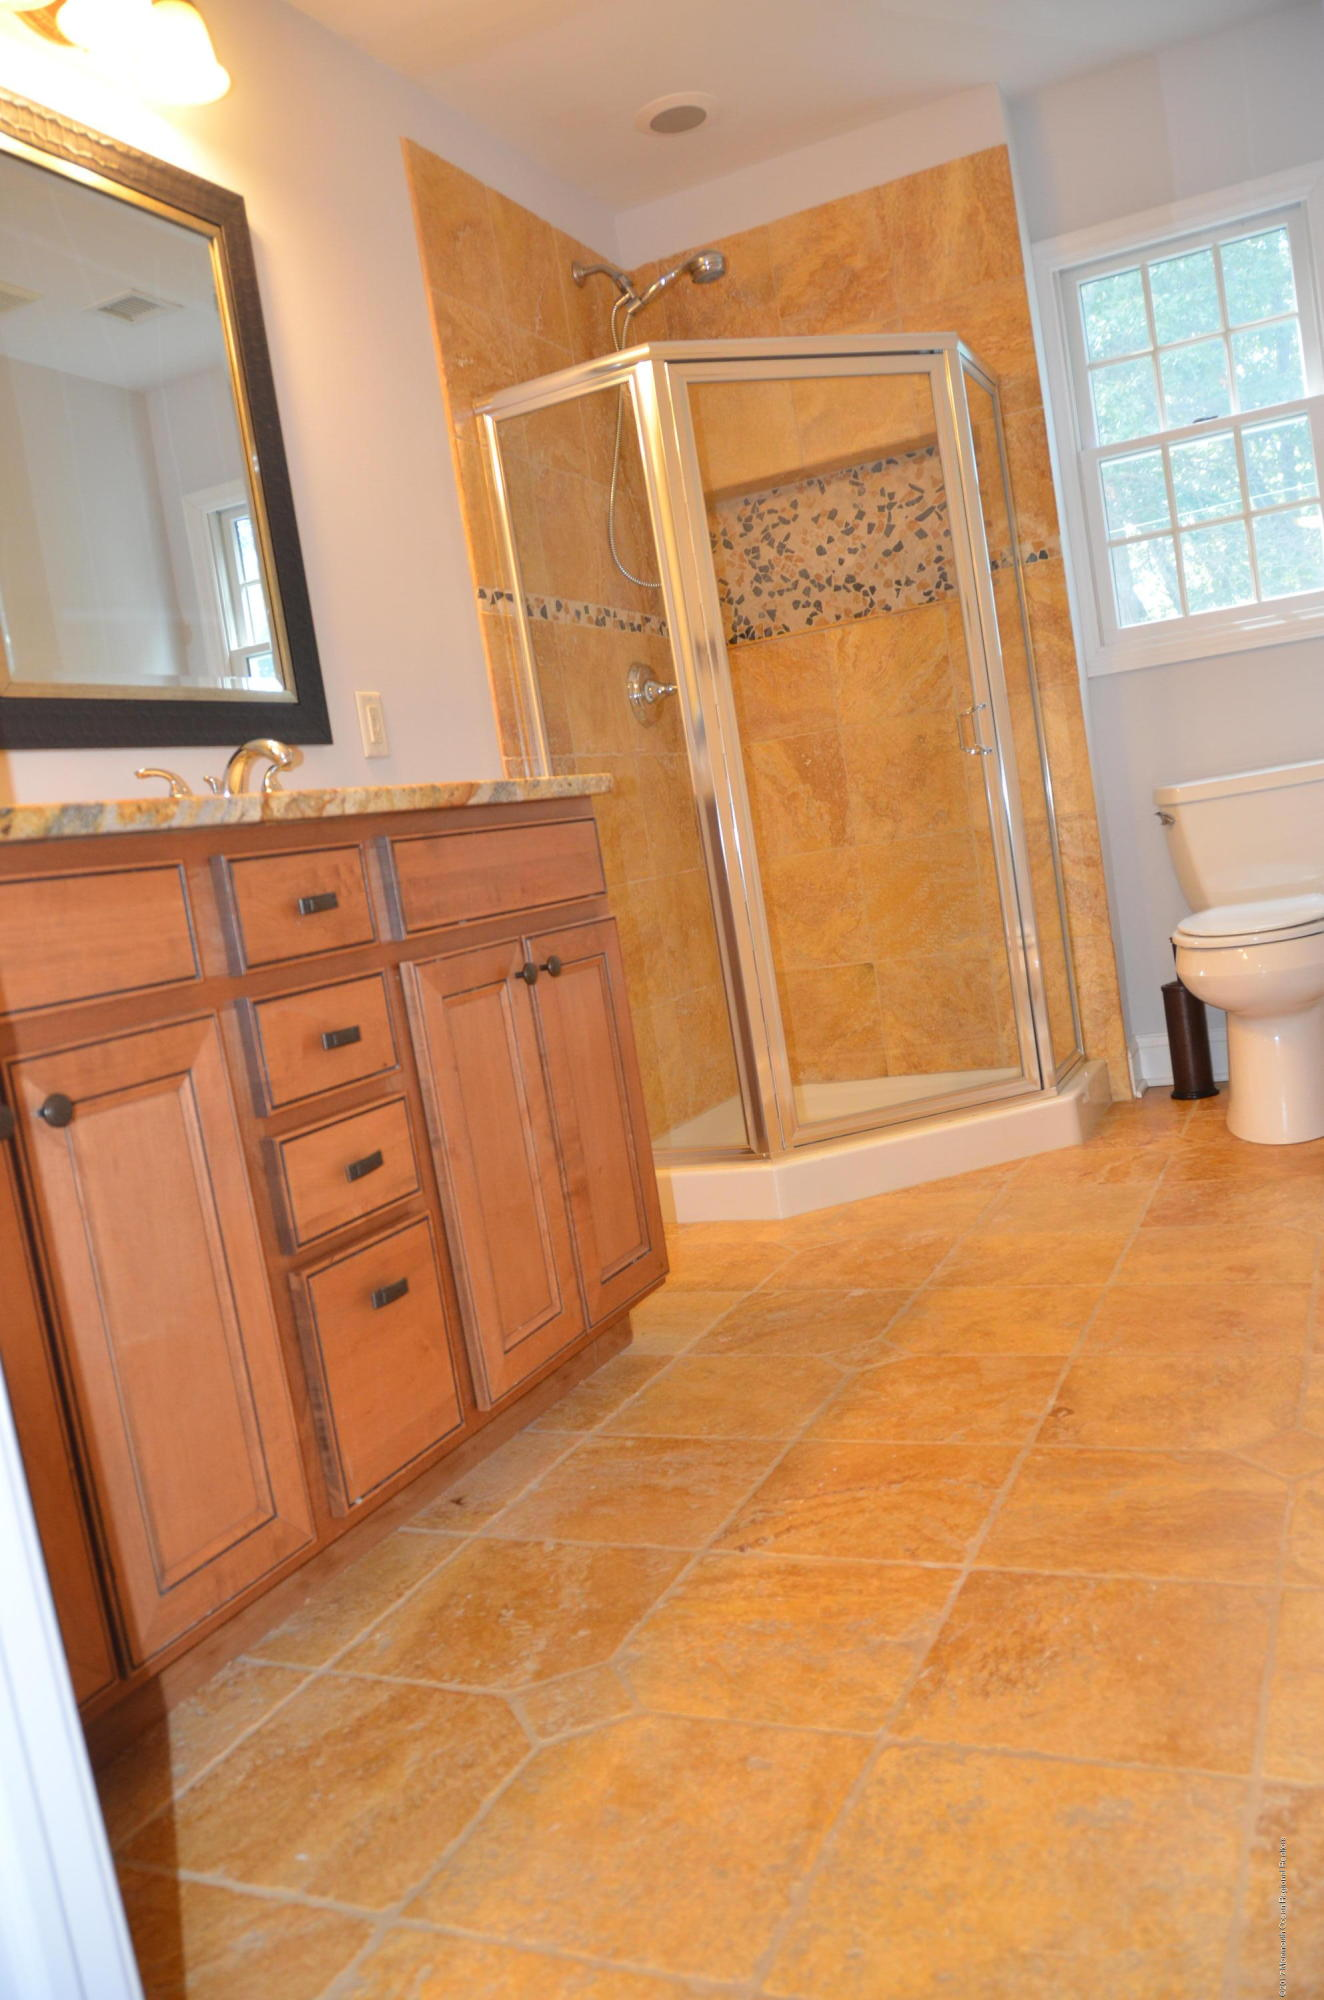 2nd flr bath-double sinks